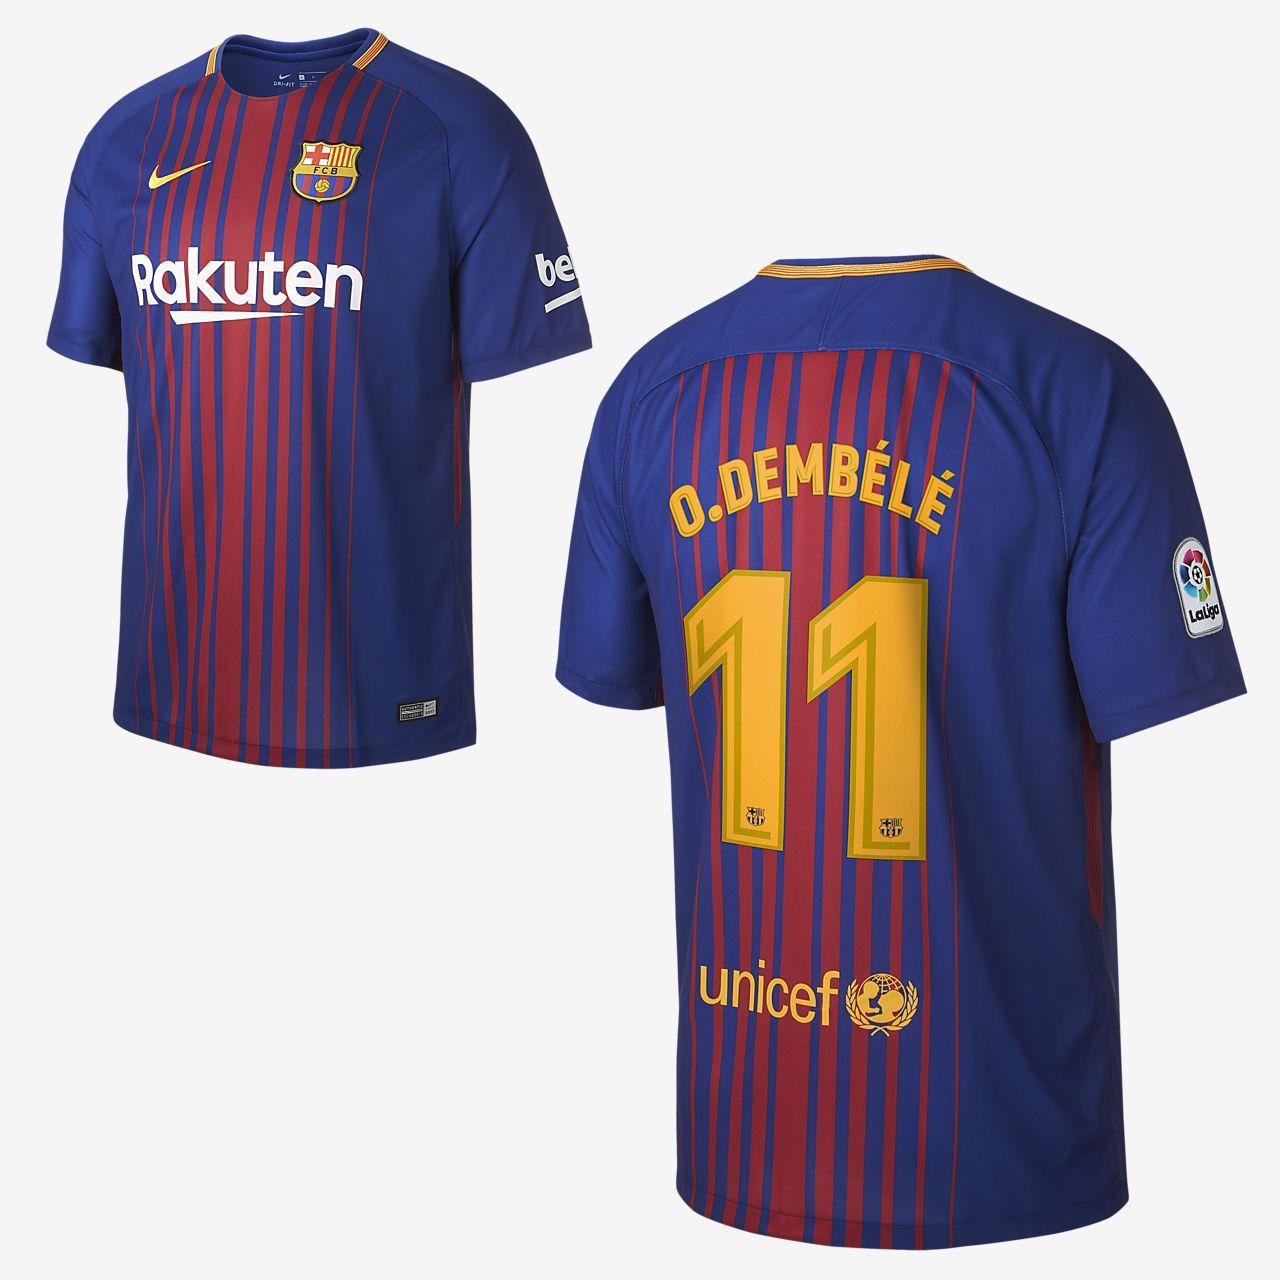 Camiseta de fútbol para hombre de local Stadium del FC Barcelona 2017 18 cdcd16fa1ff